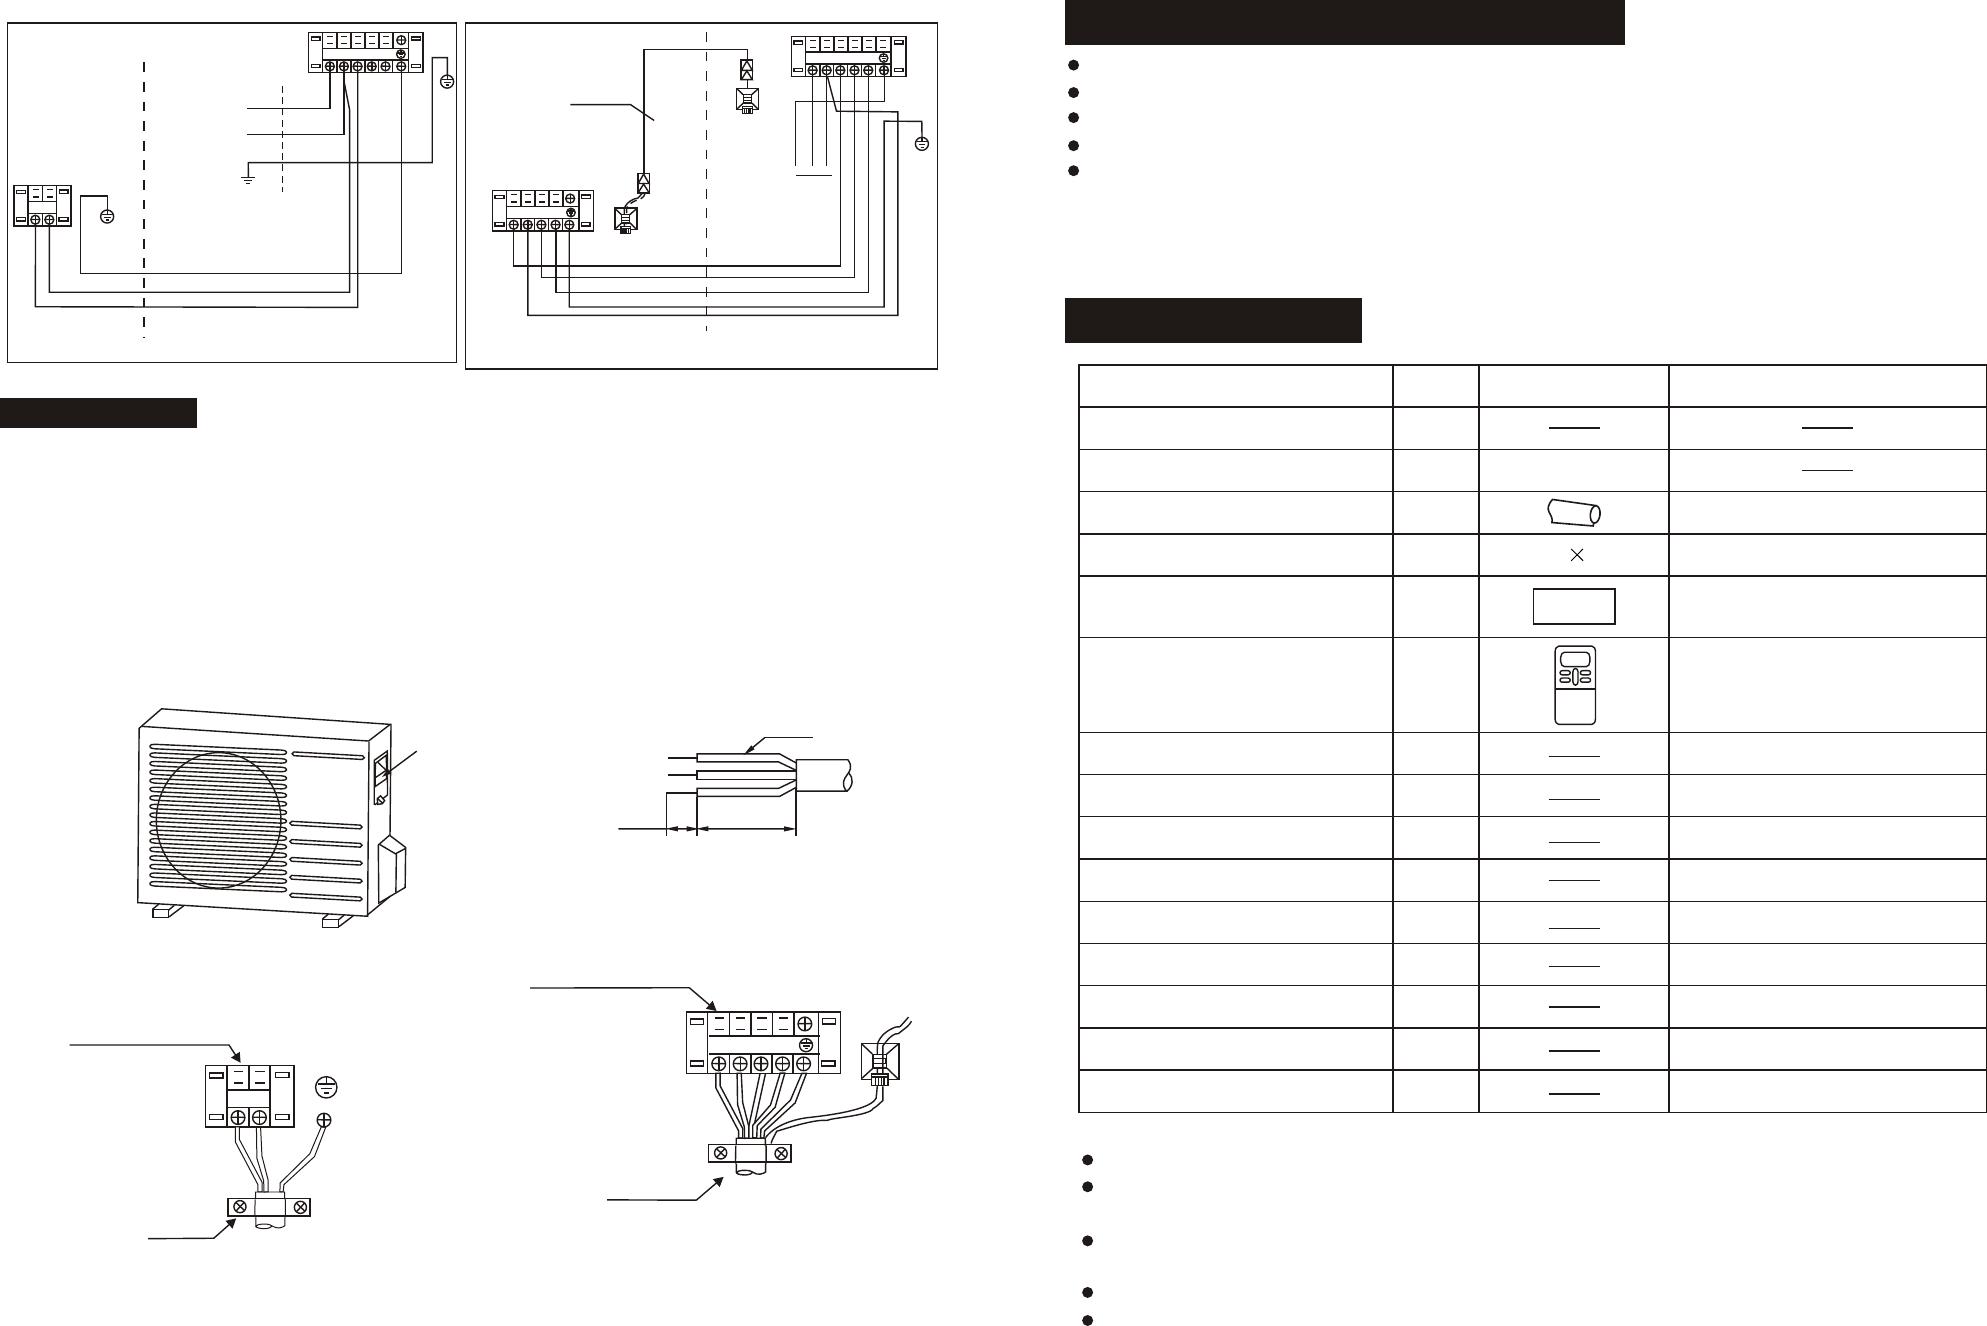 Handleiding Midea Mcb09hrn2 Pagina 1 Van 10 English Air Conditioner Wiring Diagram Installation Information